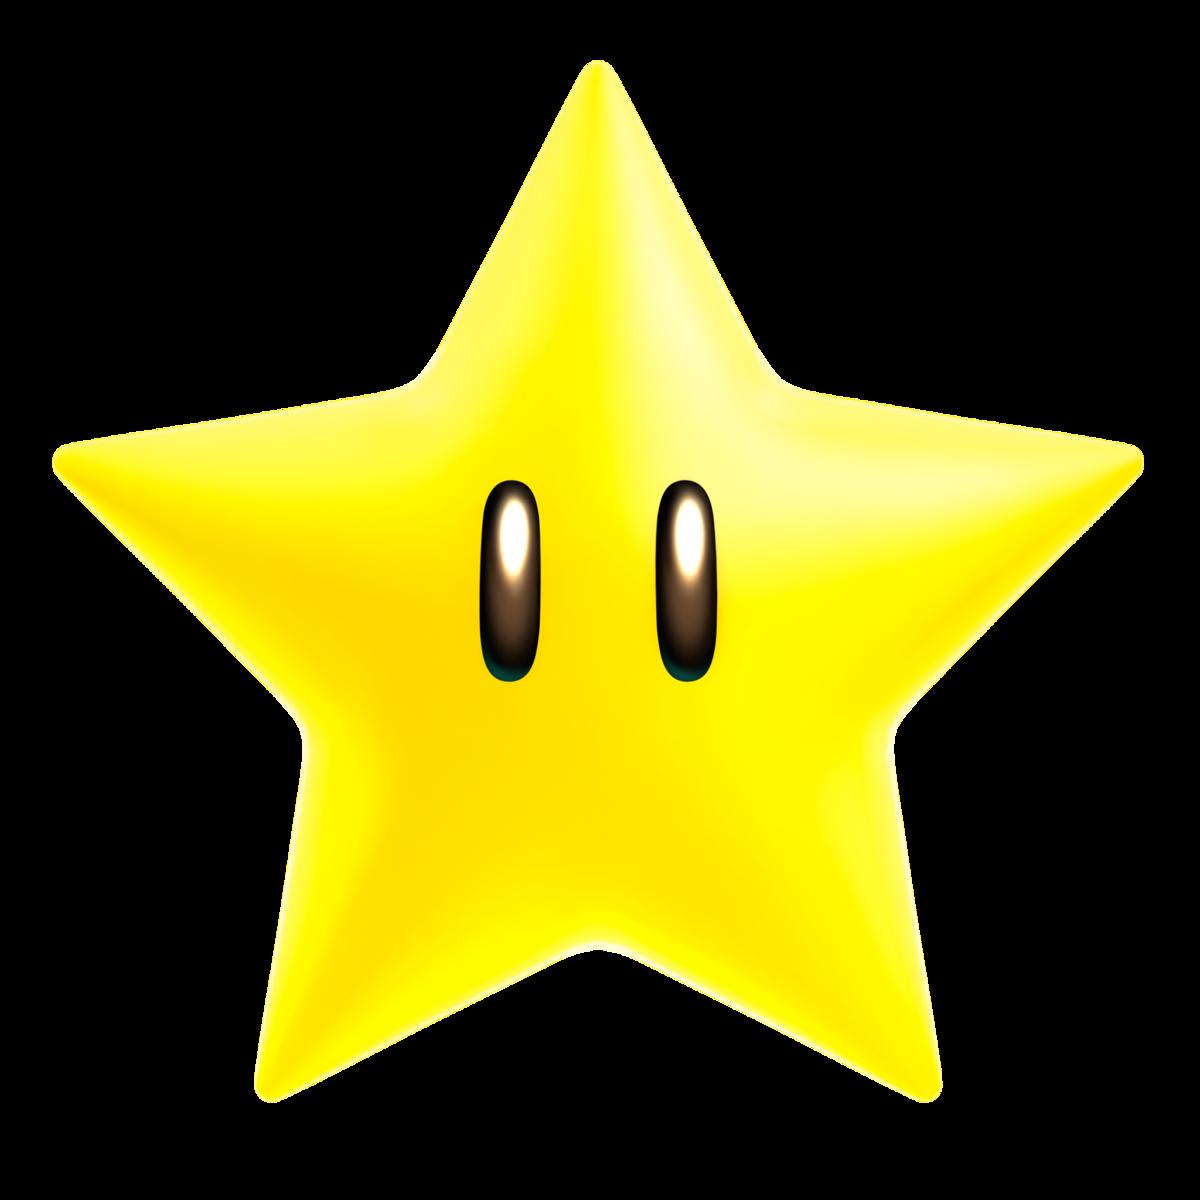 A Starman in Mario Kart